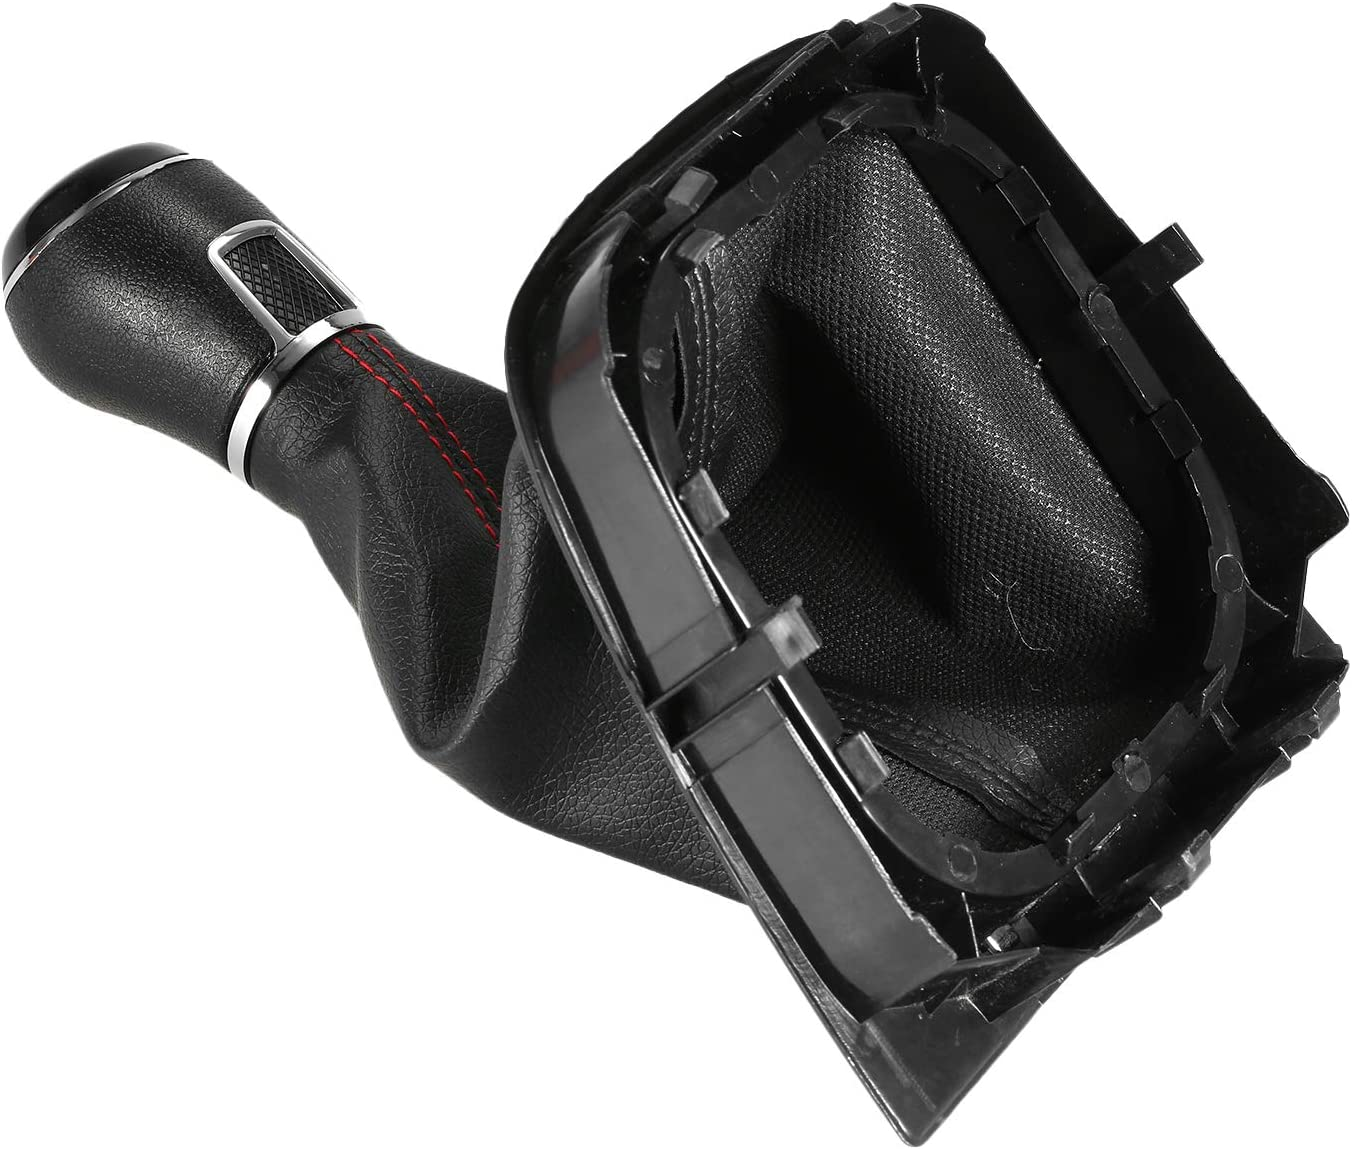 XLTWKK 5-Gang-Auto Handschaltknauf Schalthebel Hebelkopf Handballkoffer f/ür Hyundai Elantra I30 Kia Forte Soul